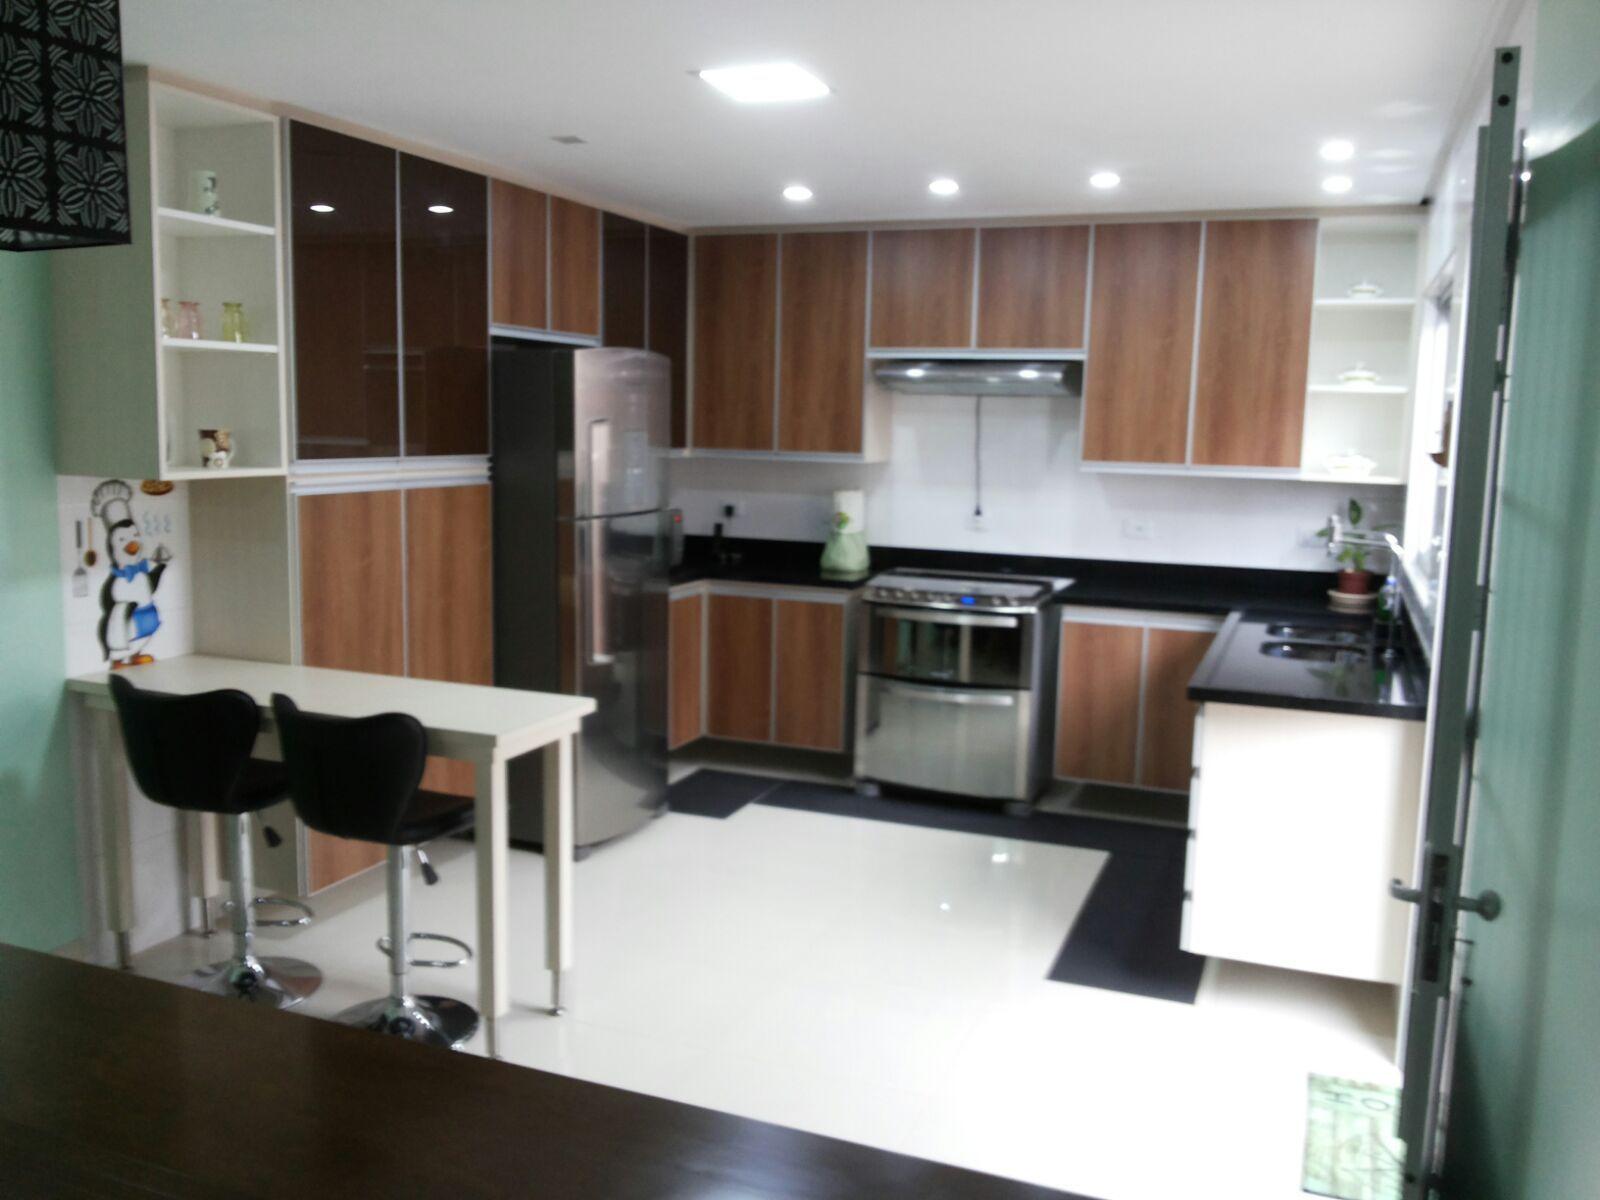 Cozinha Planejada Curitiba Combo Casa Toda Aliana Mveis With